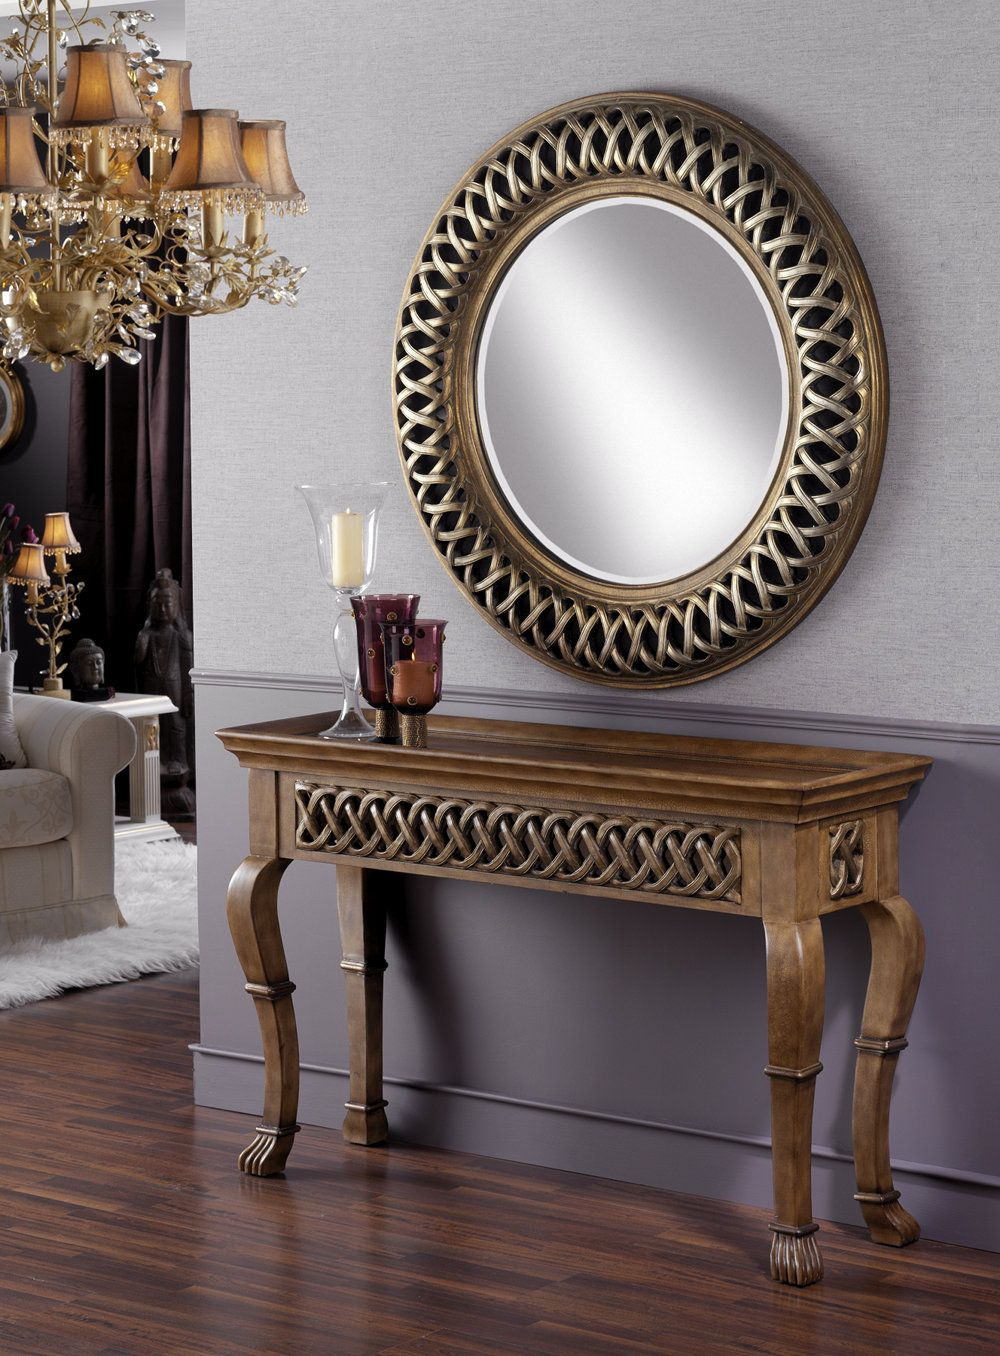 Espejos cl sicos decorativos marcos for Espejos para consolas